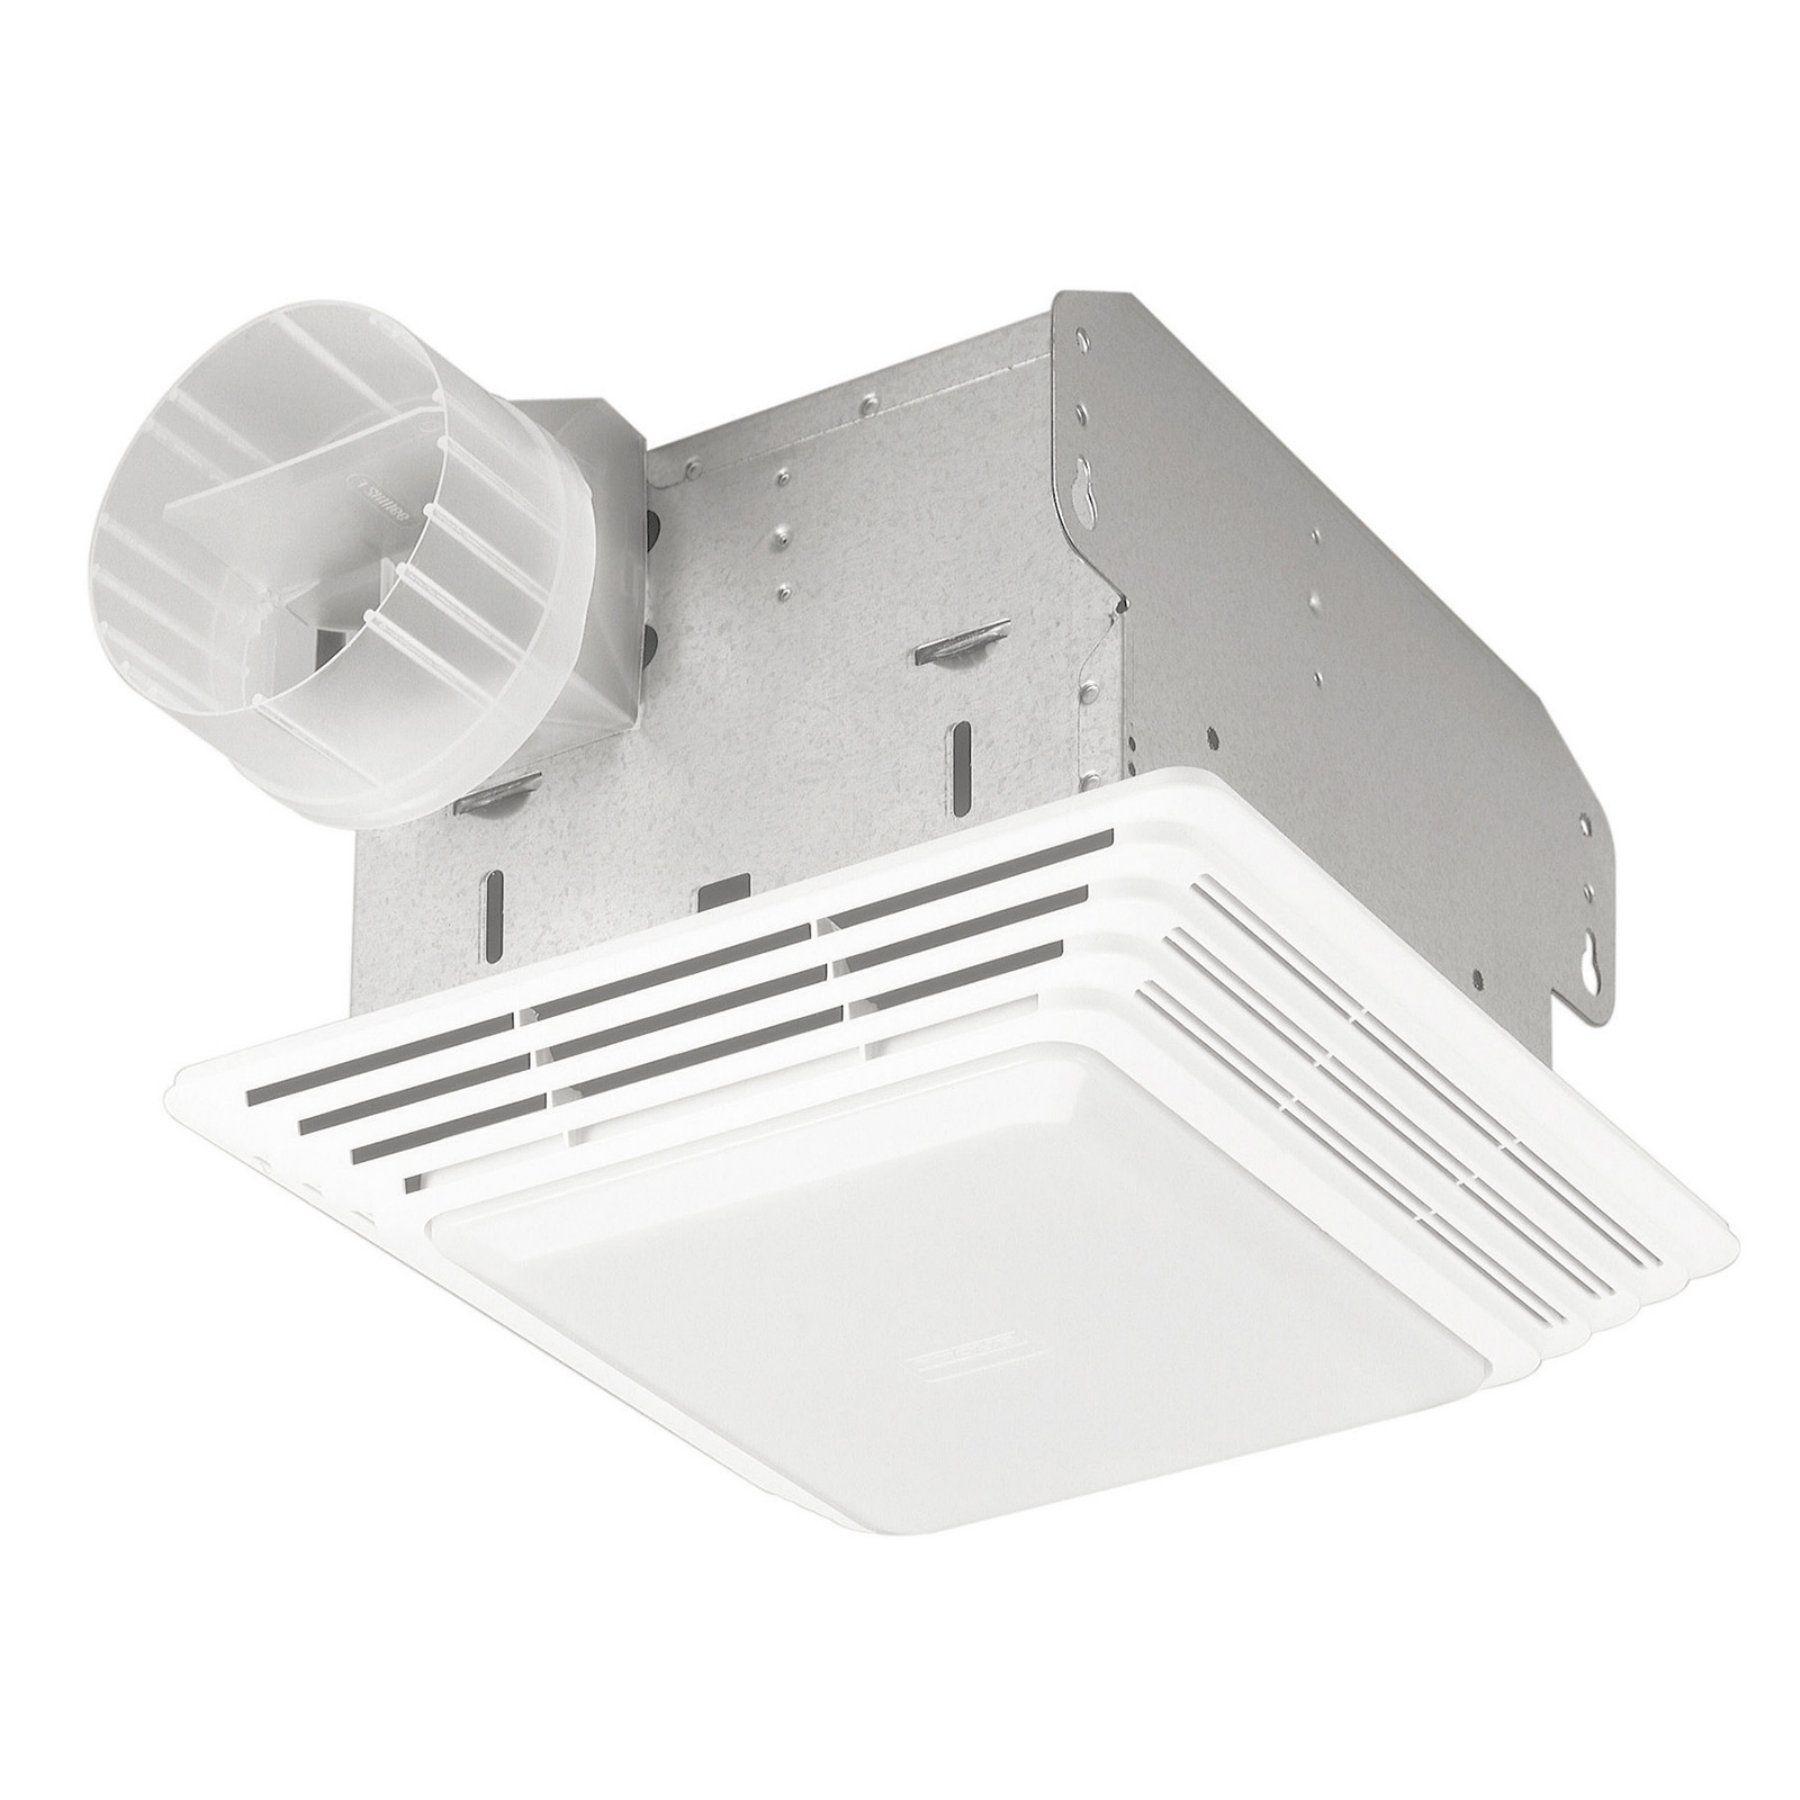 Plug In Bathroom Exhaust Fans